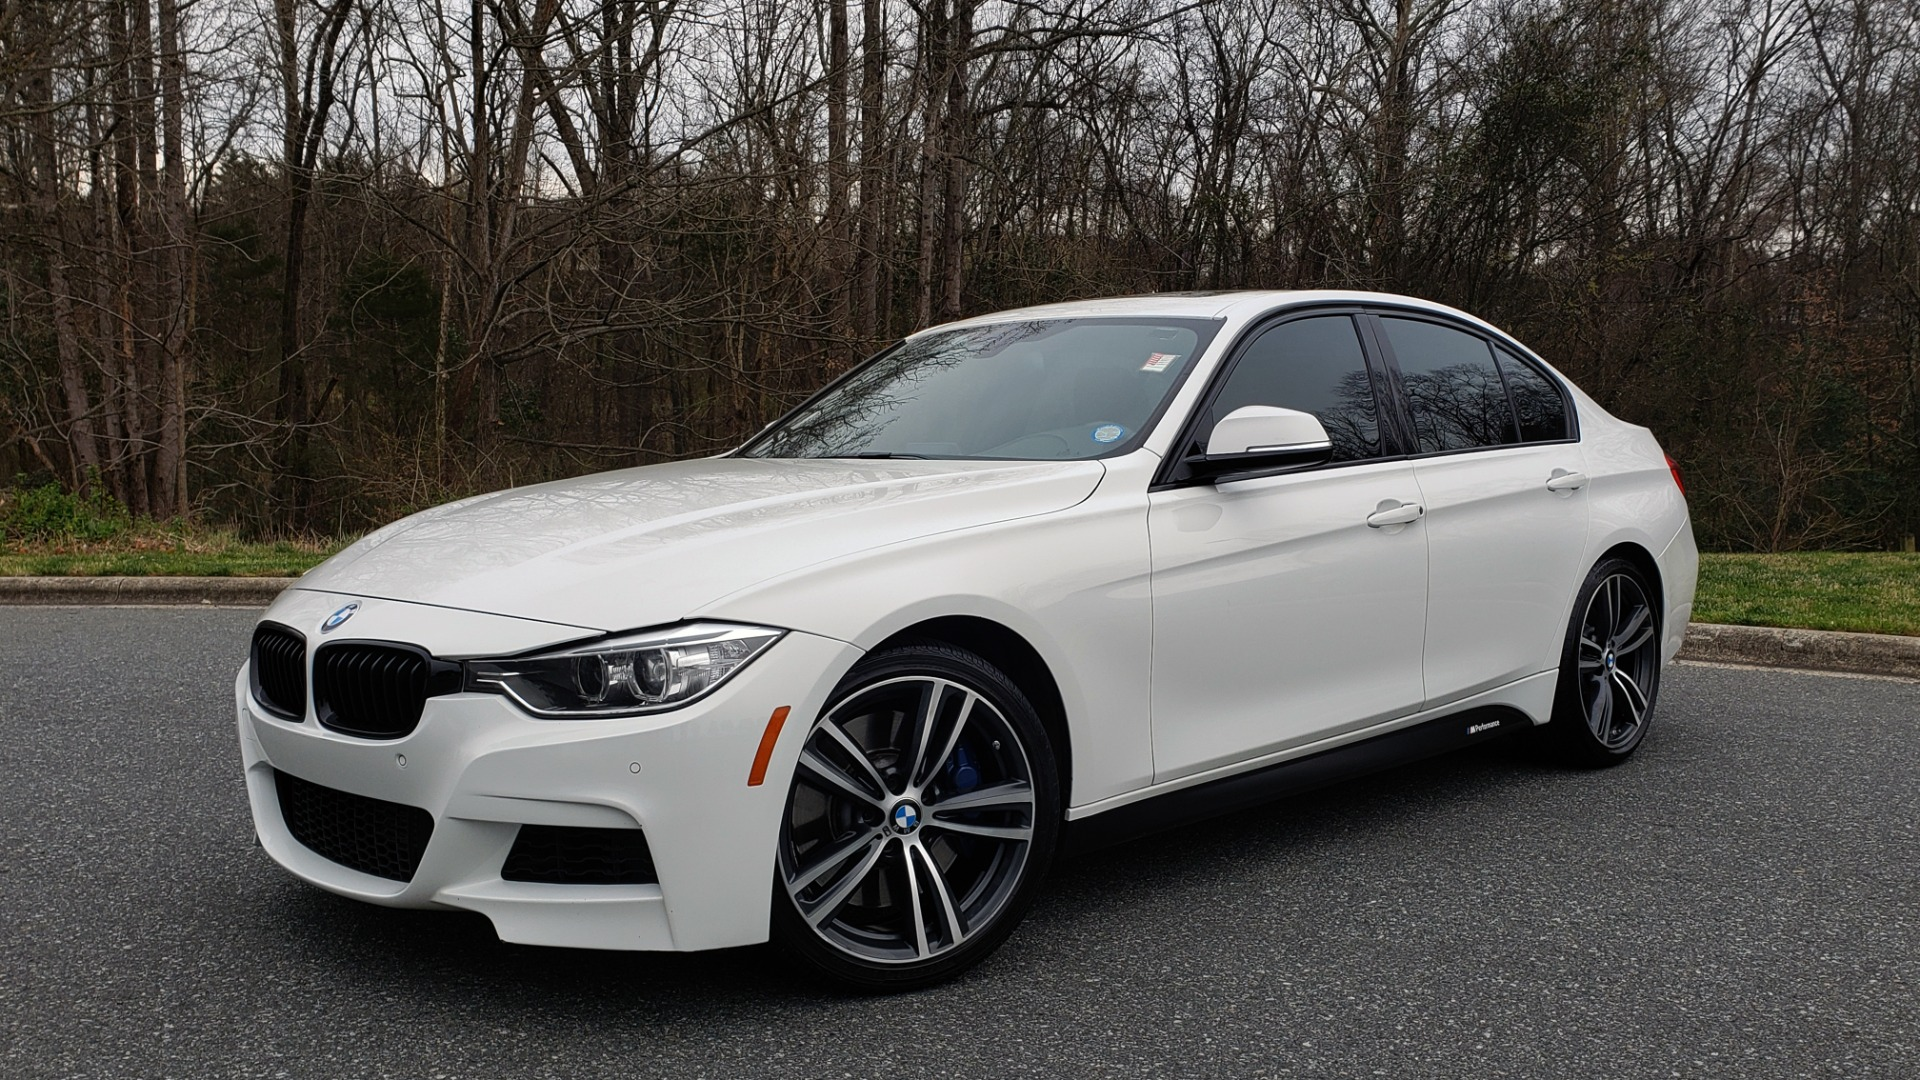 Used 2015 BMW 3 Series 335I M-SPORT / PREM PKG / HK SND / SUNROOF / REARVIEW for sale Sold at Formula Imports in Charlotte NC 28227 1